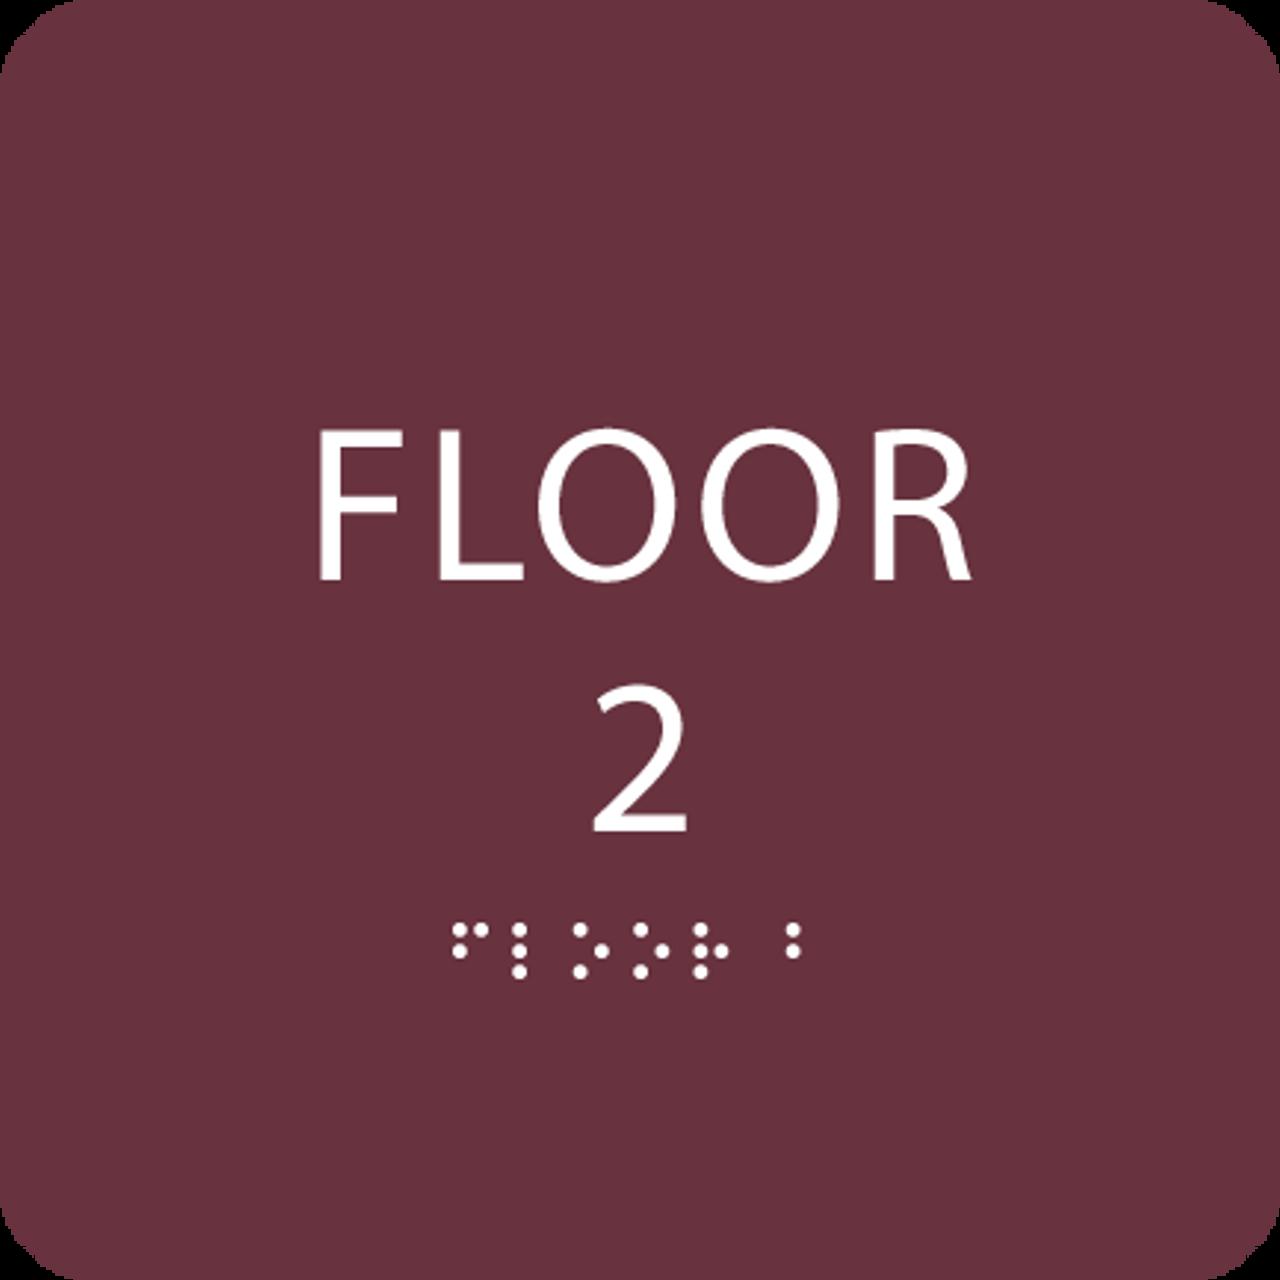 Burgundy Floor 2 Identification Sign